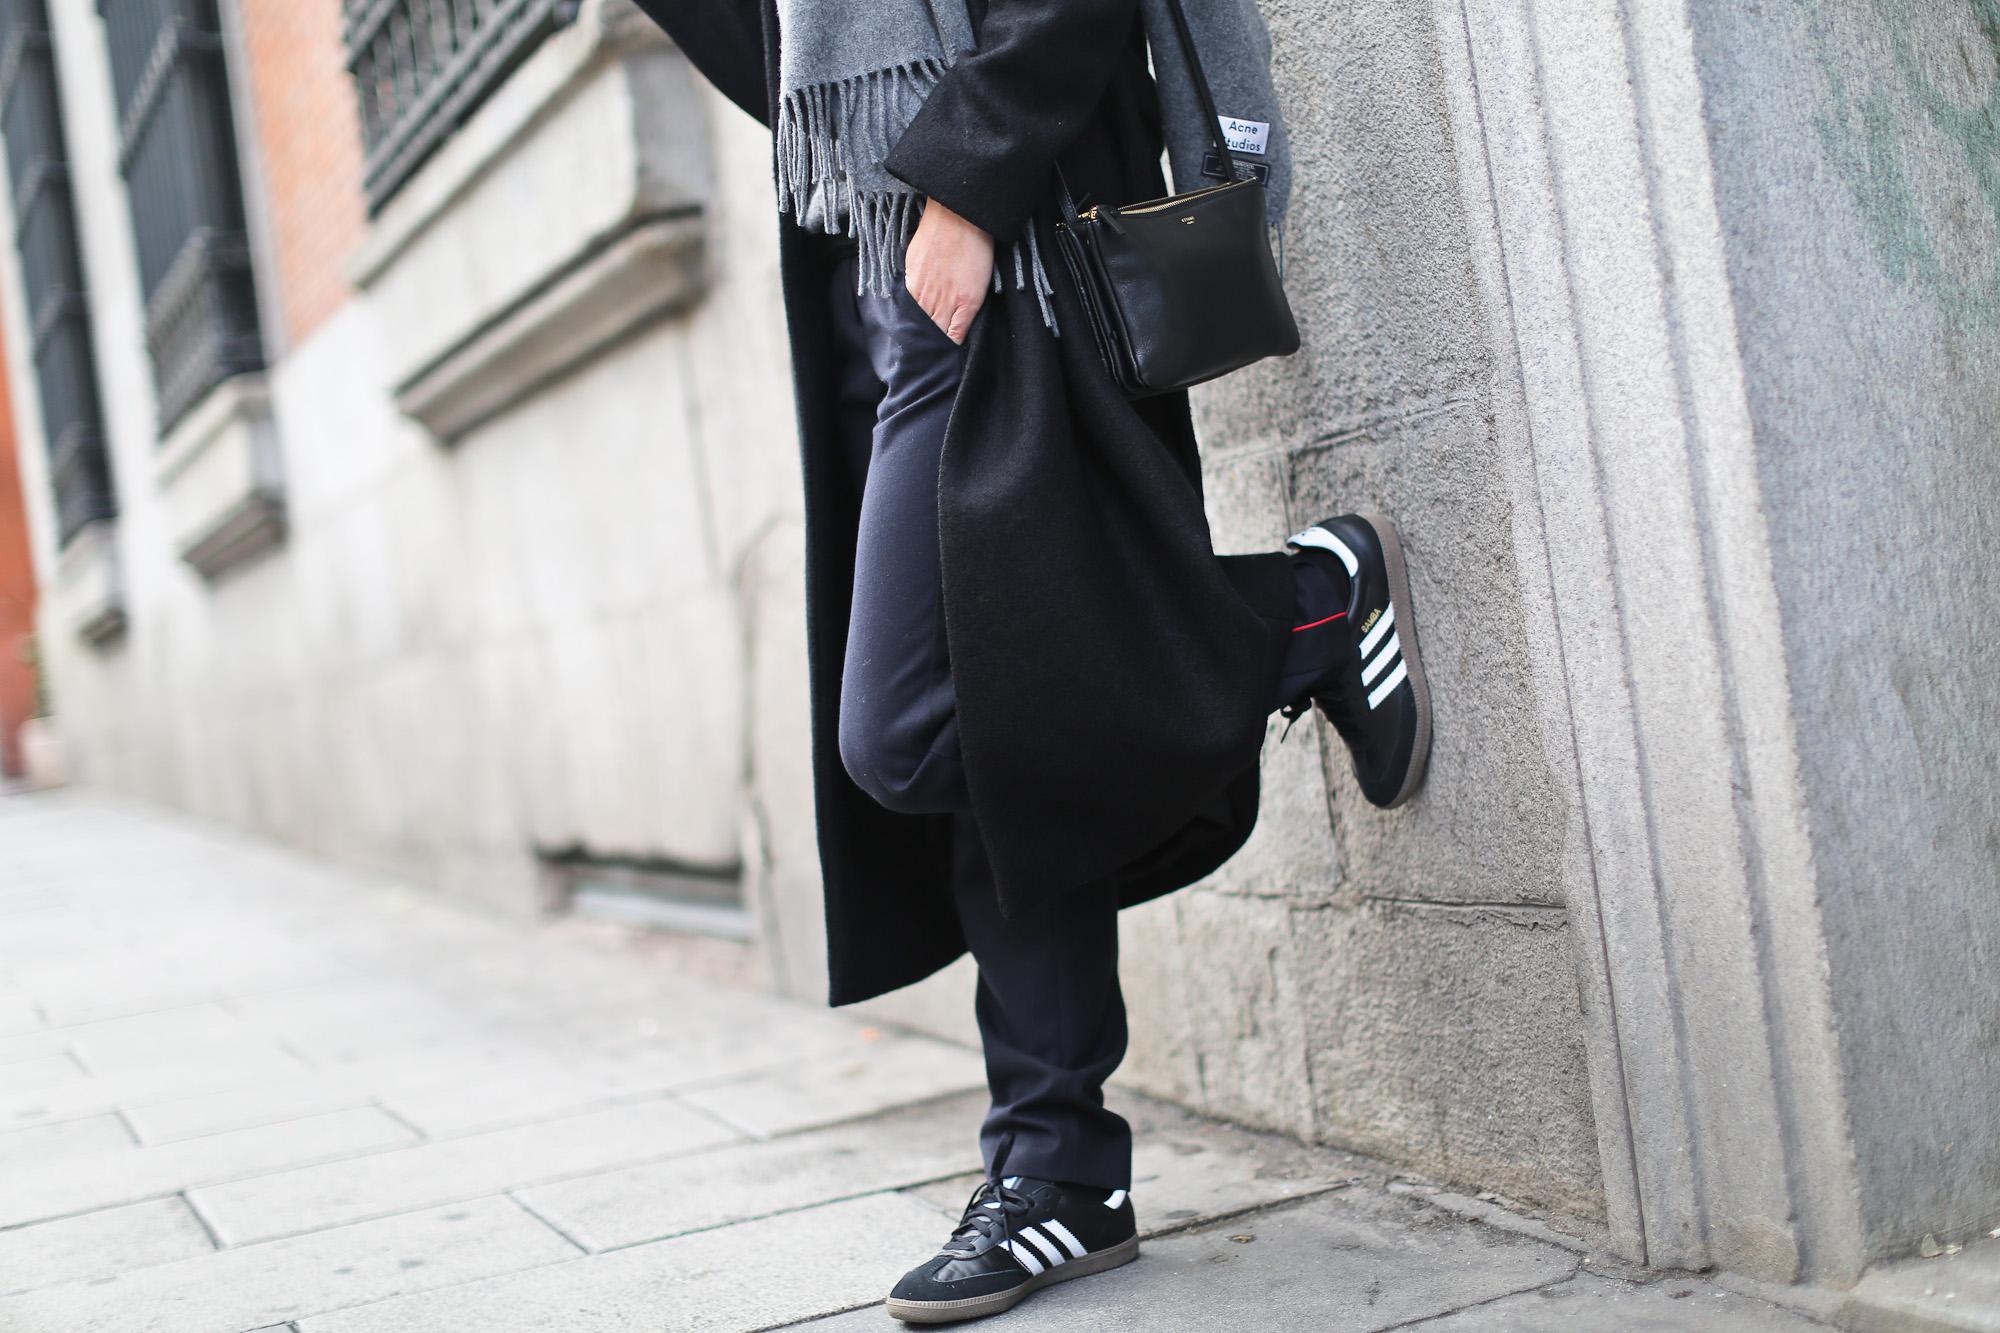 Clochet_streetstyle_cos_wool_long_coat_maje_panta_adidas_samba-15